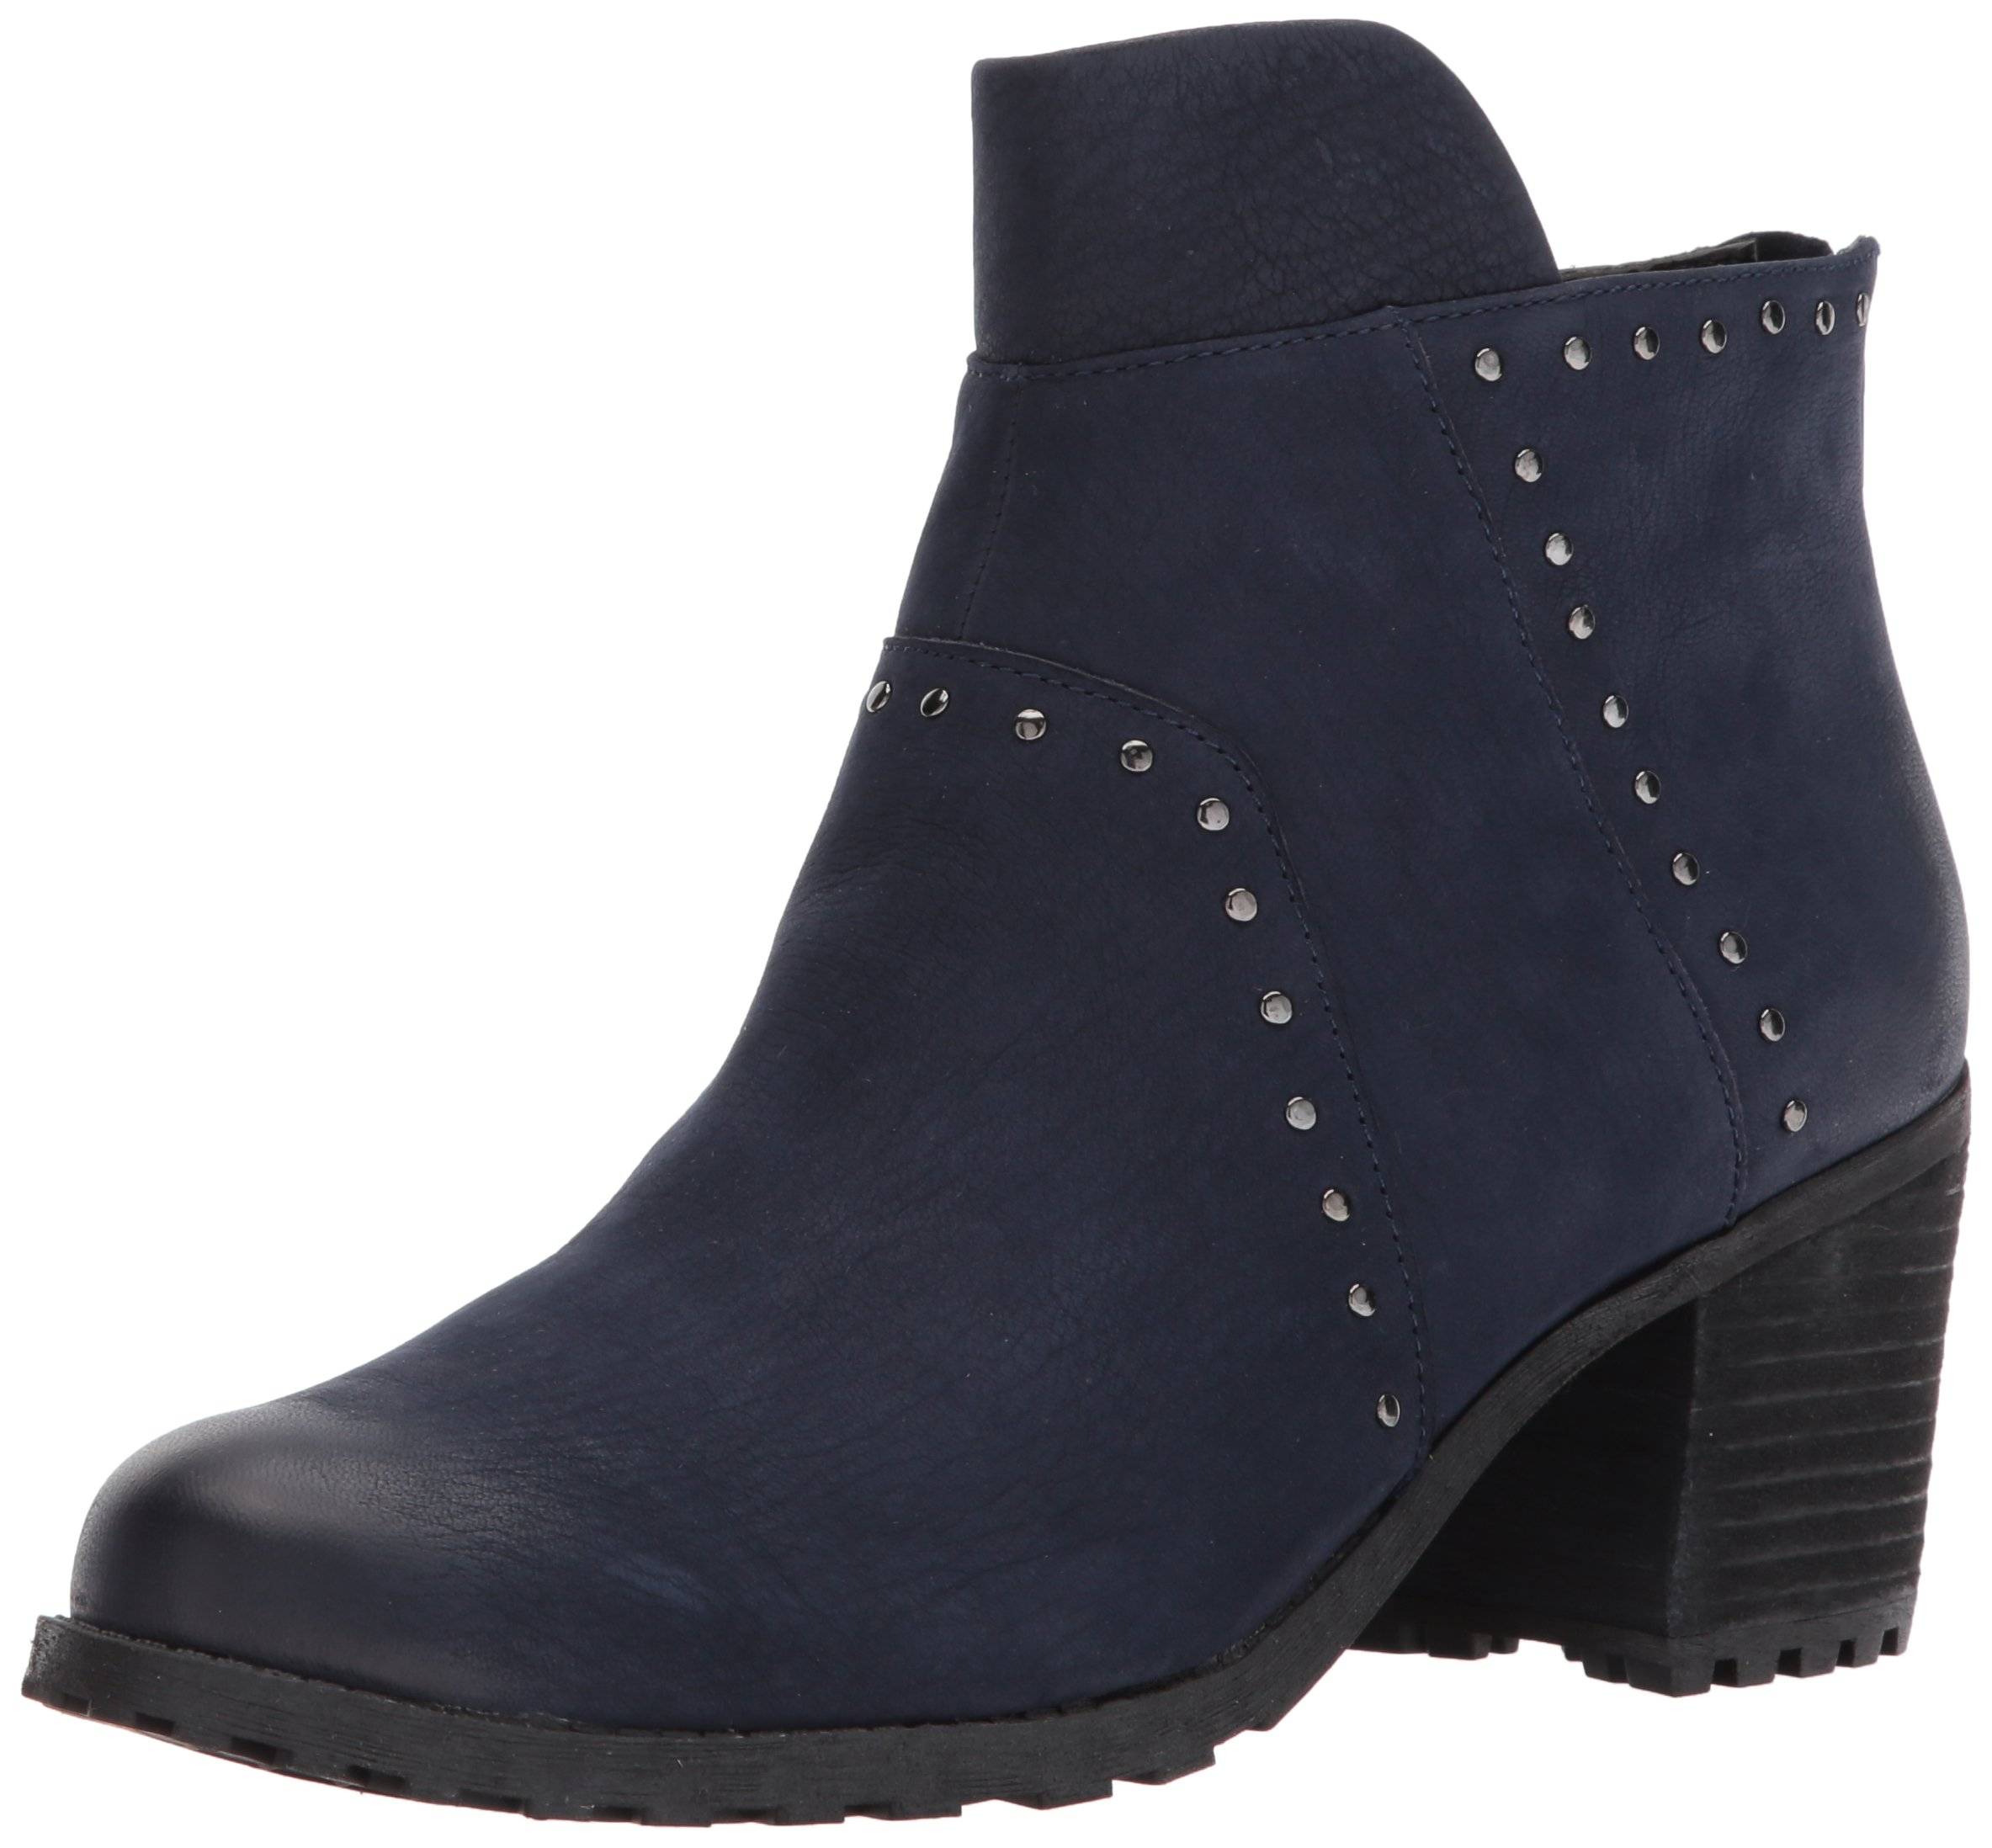 Aerosoles Women's incentive Ankle Boot, Navy Nubuck, 9.5 M US